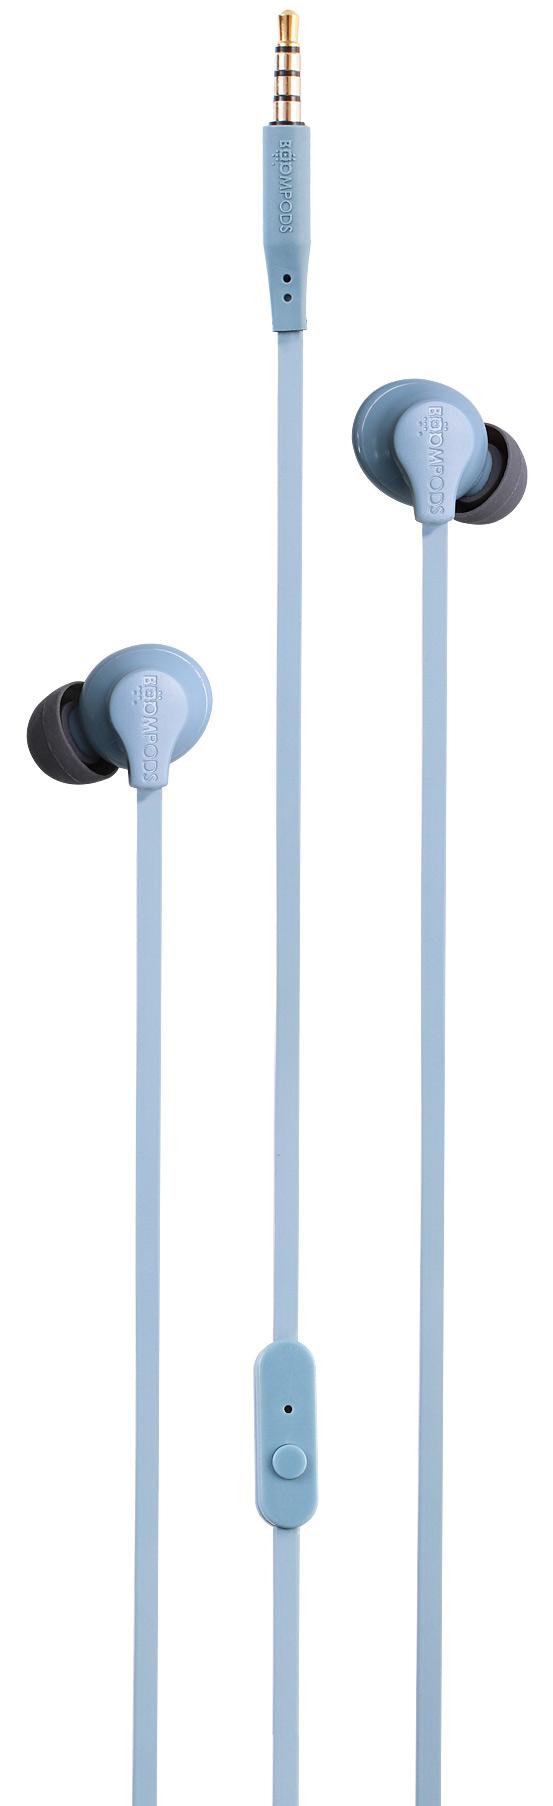 Boompods sportline plug-in